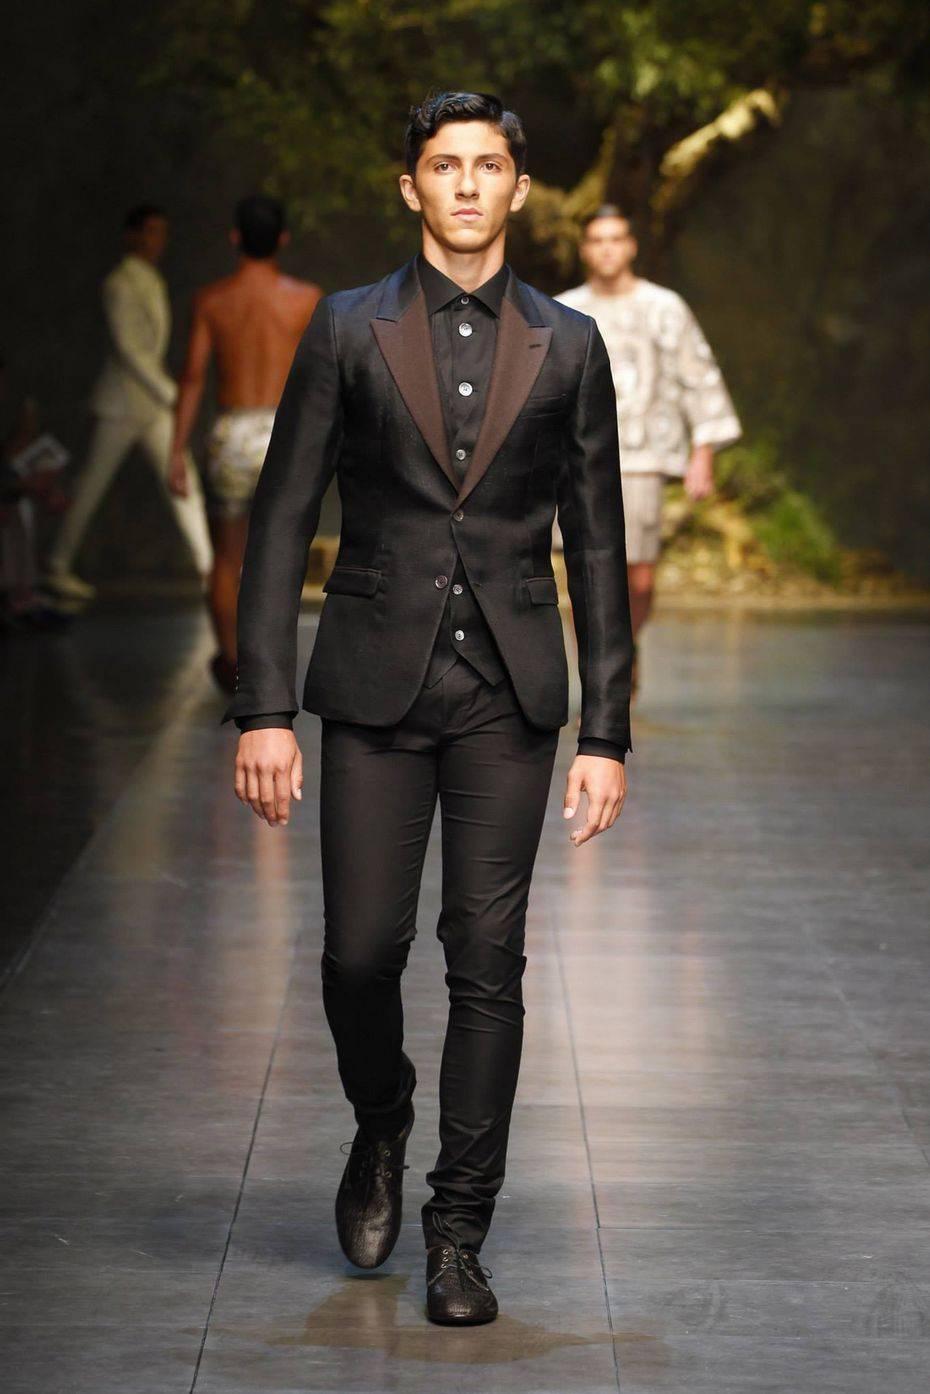 Мода весна 2018 основные тенденции фото